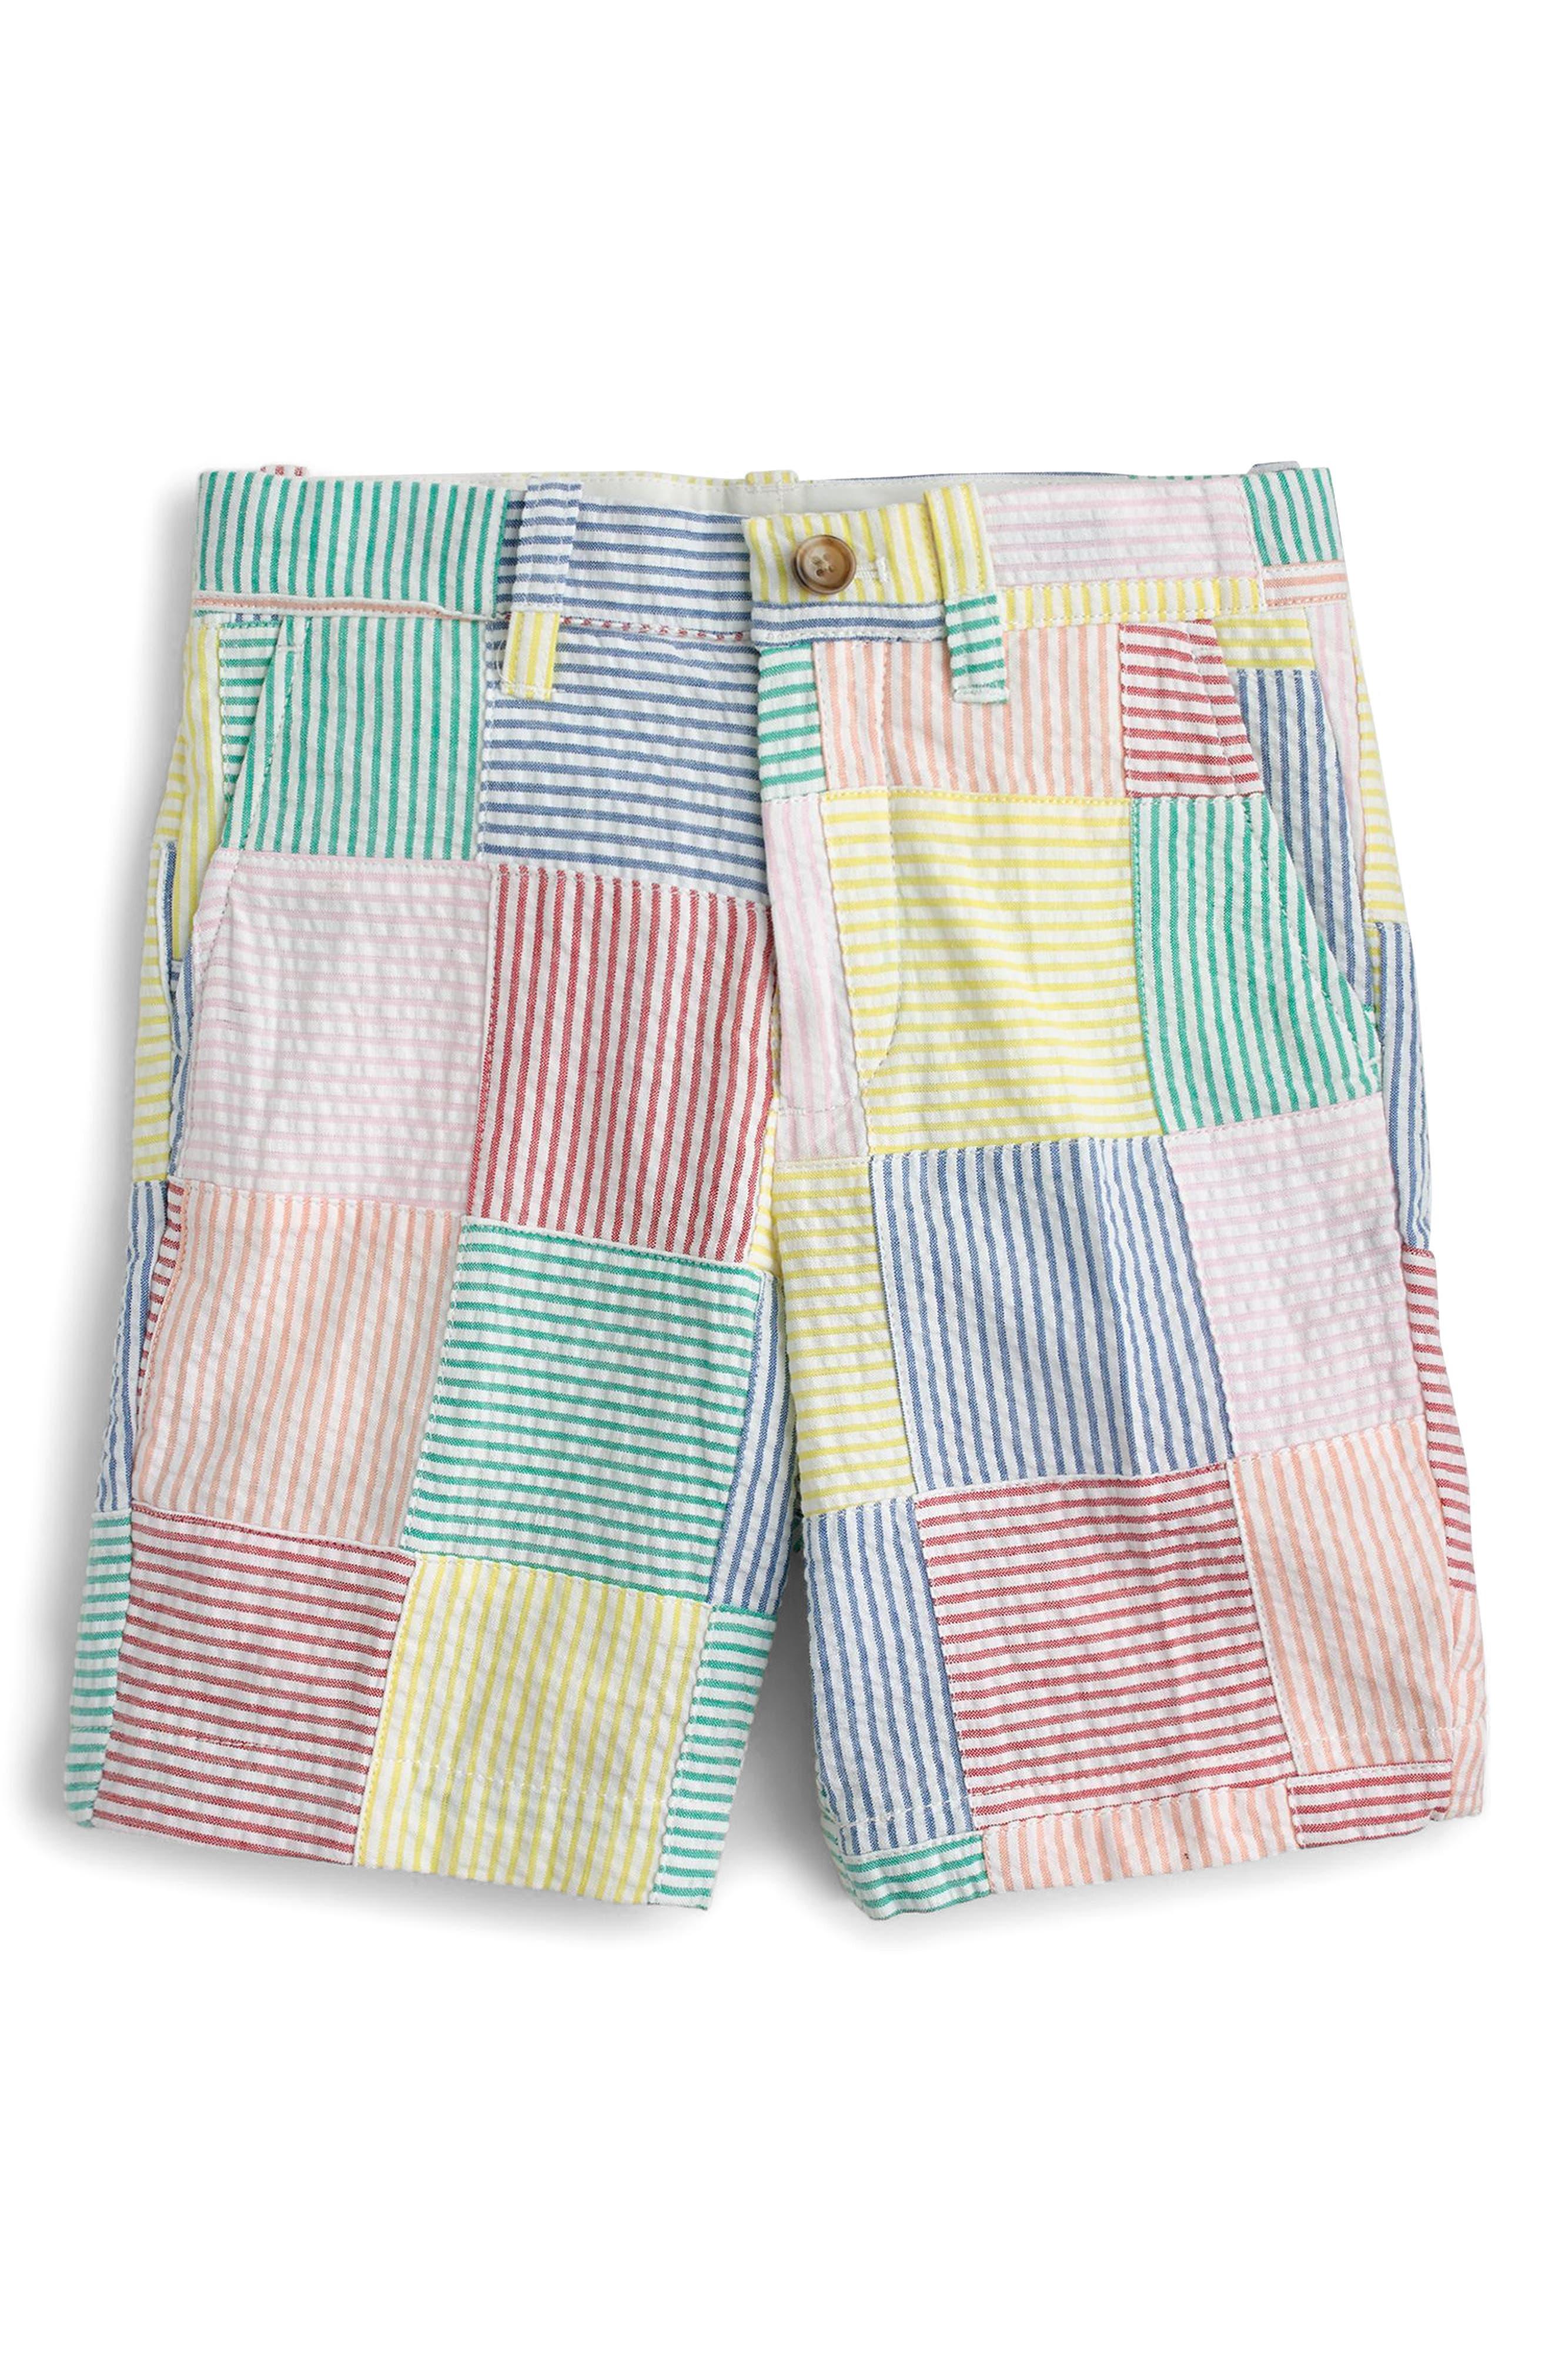 Crewcuts Stanton Patchwork Shorts,                             Main thumbnail 1, color,                             900